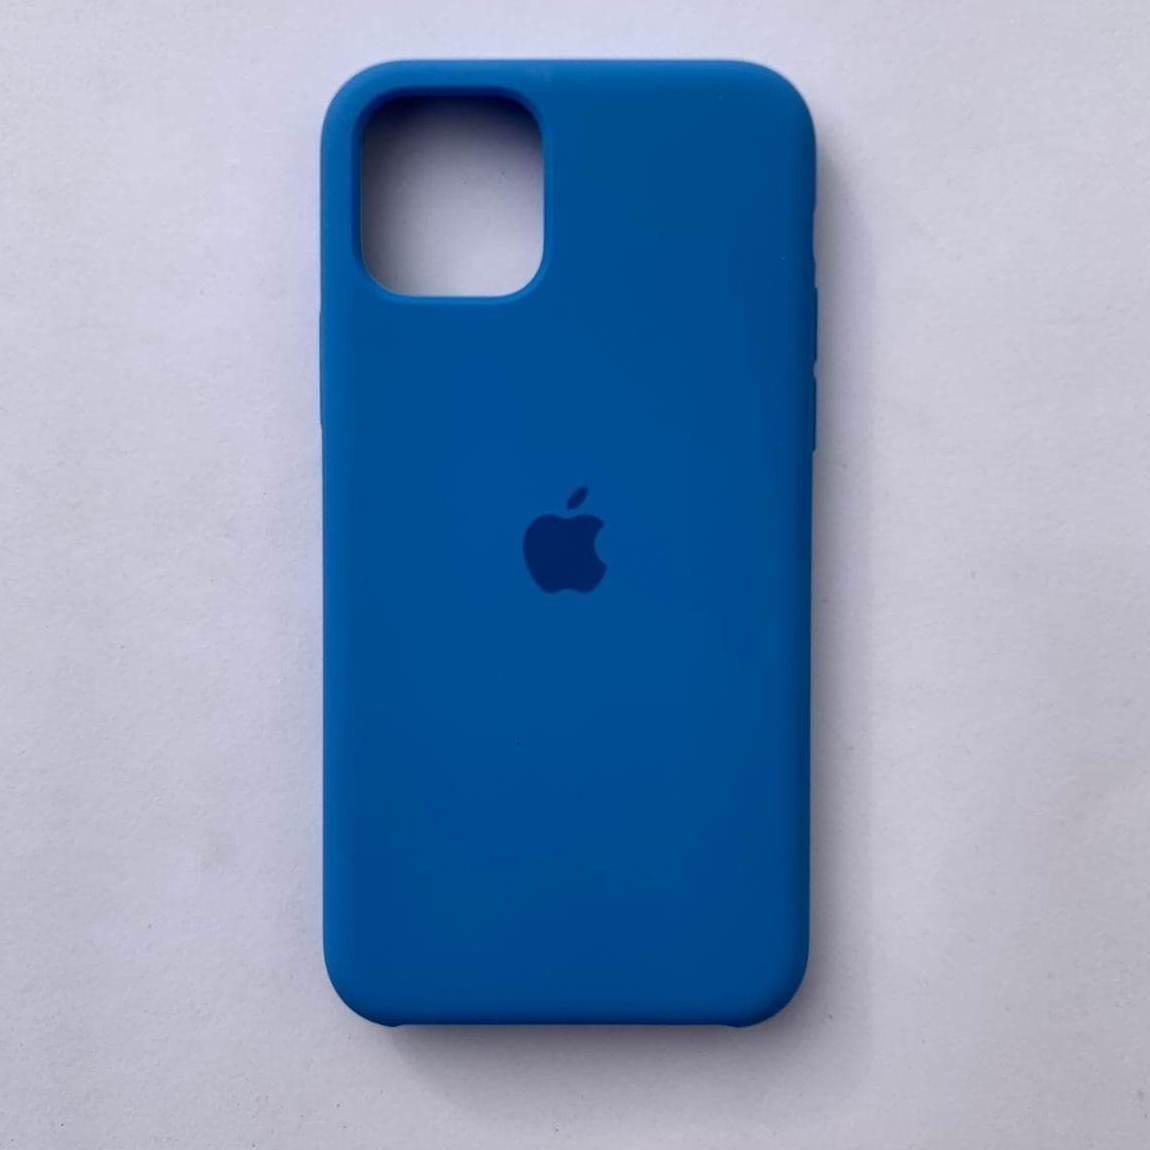 Чехол Silicone Case для Apple iPhone 11 Pro Max Blue Cobalt